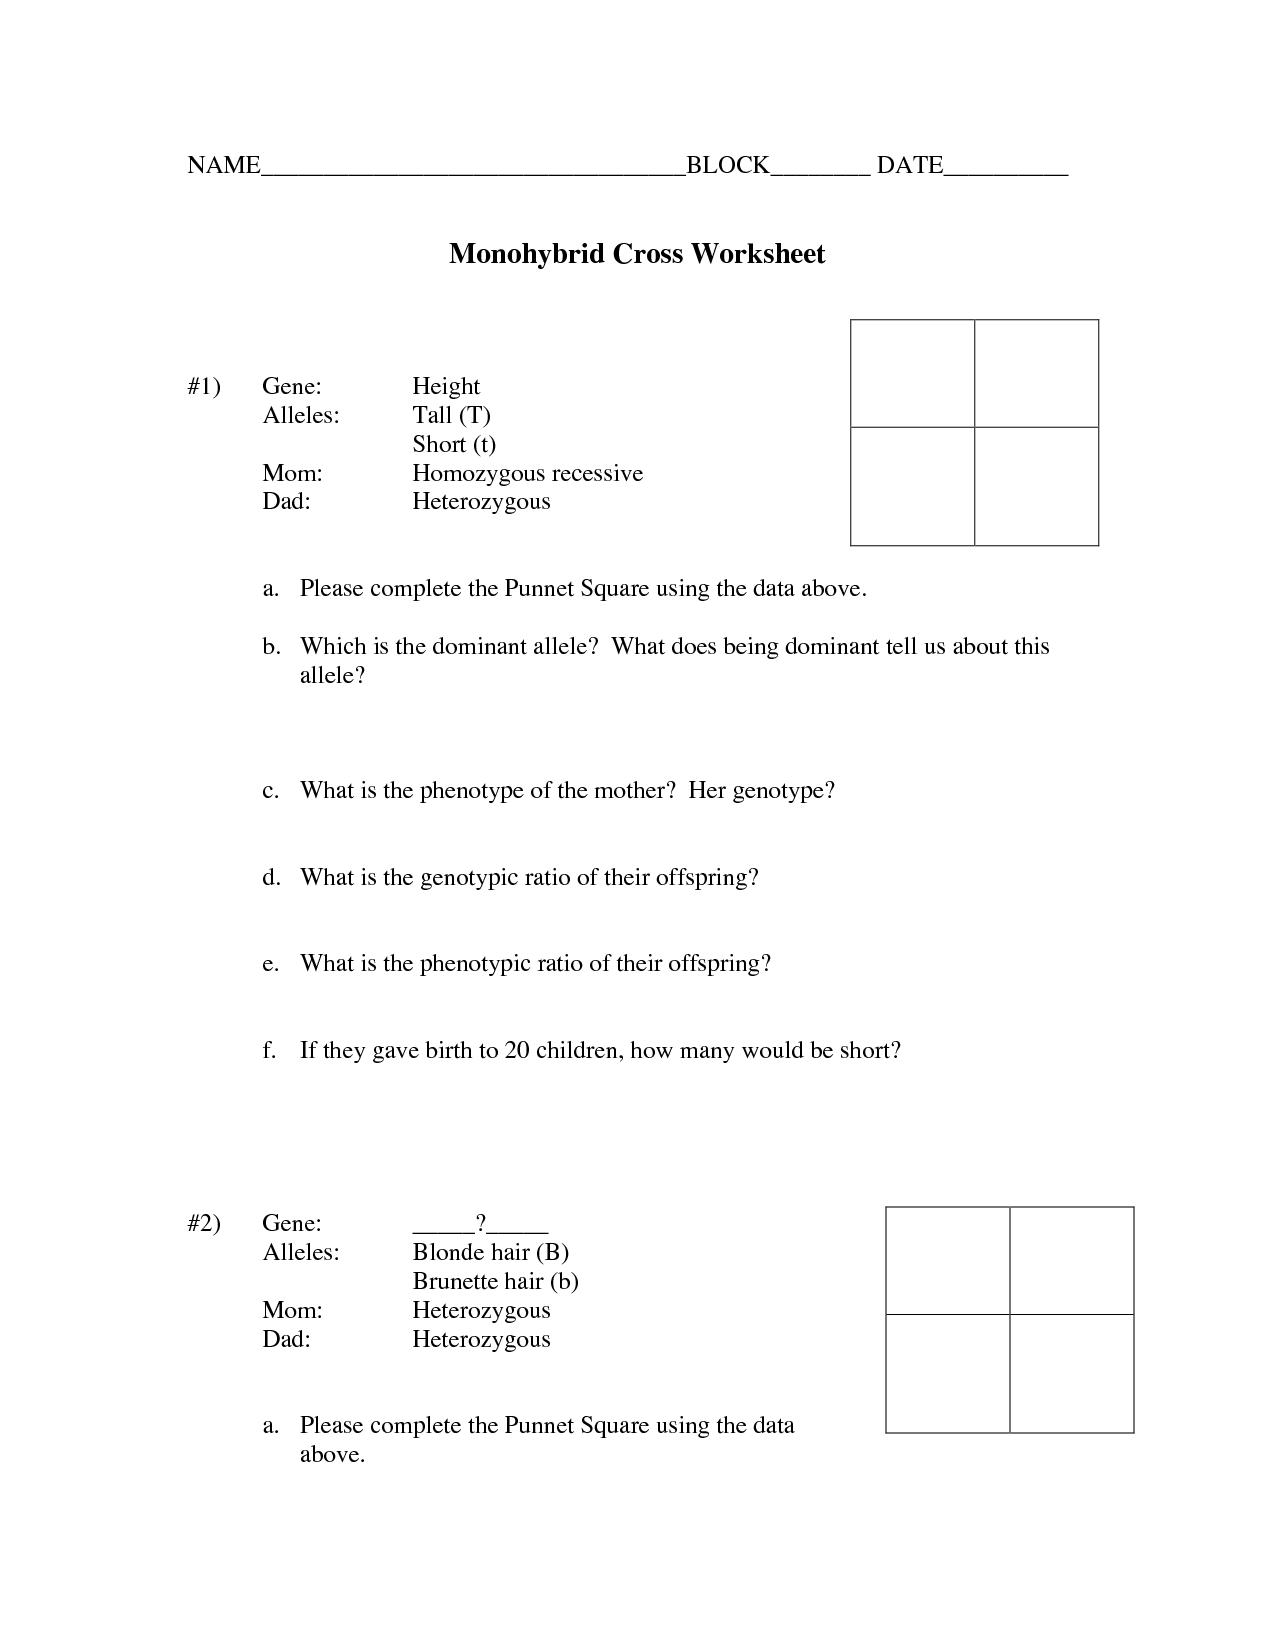 Dihybrid Cross Worksheet Answers